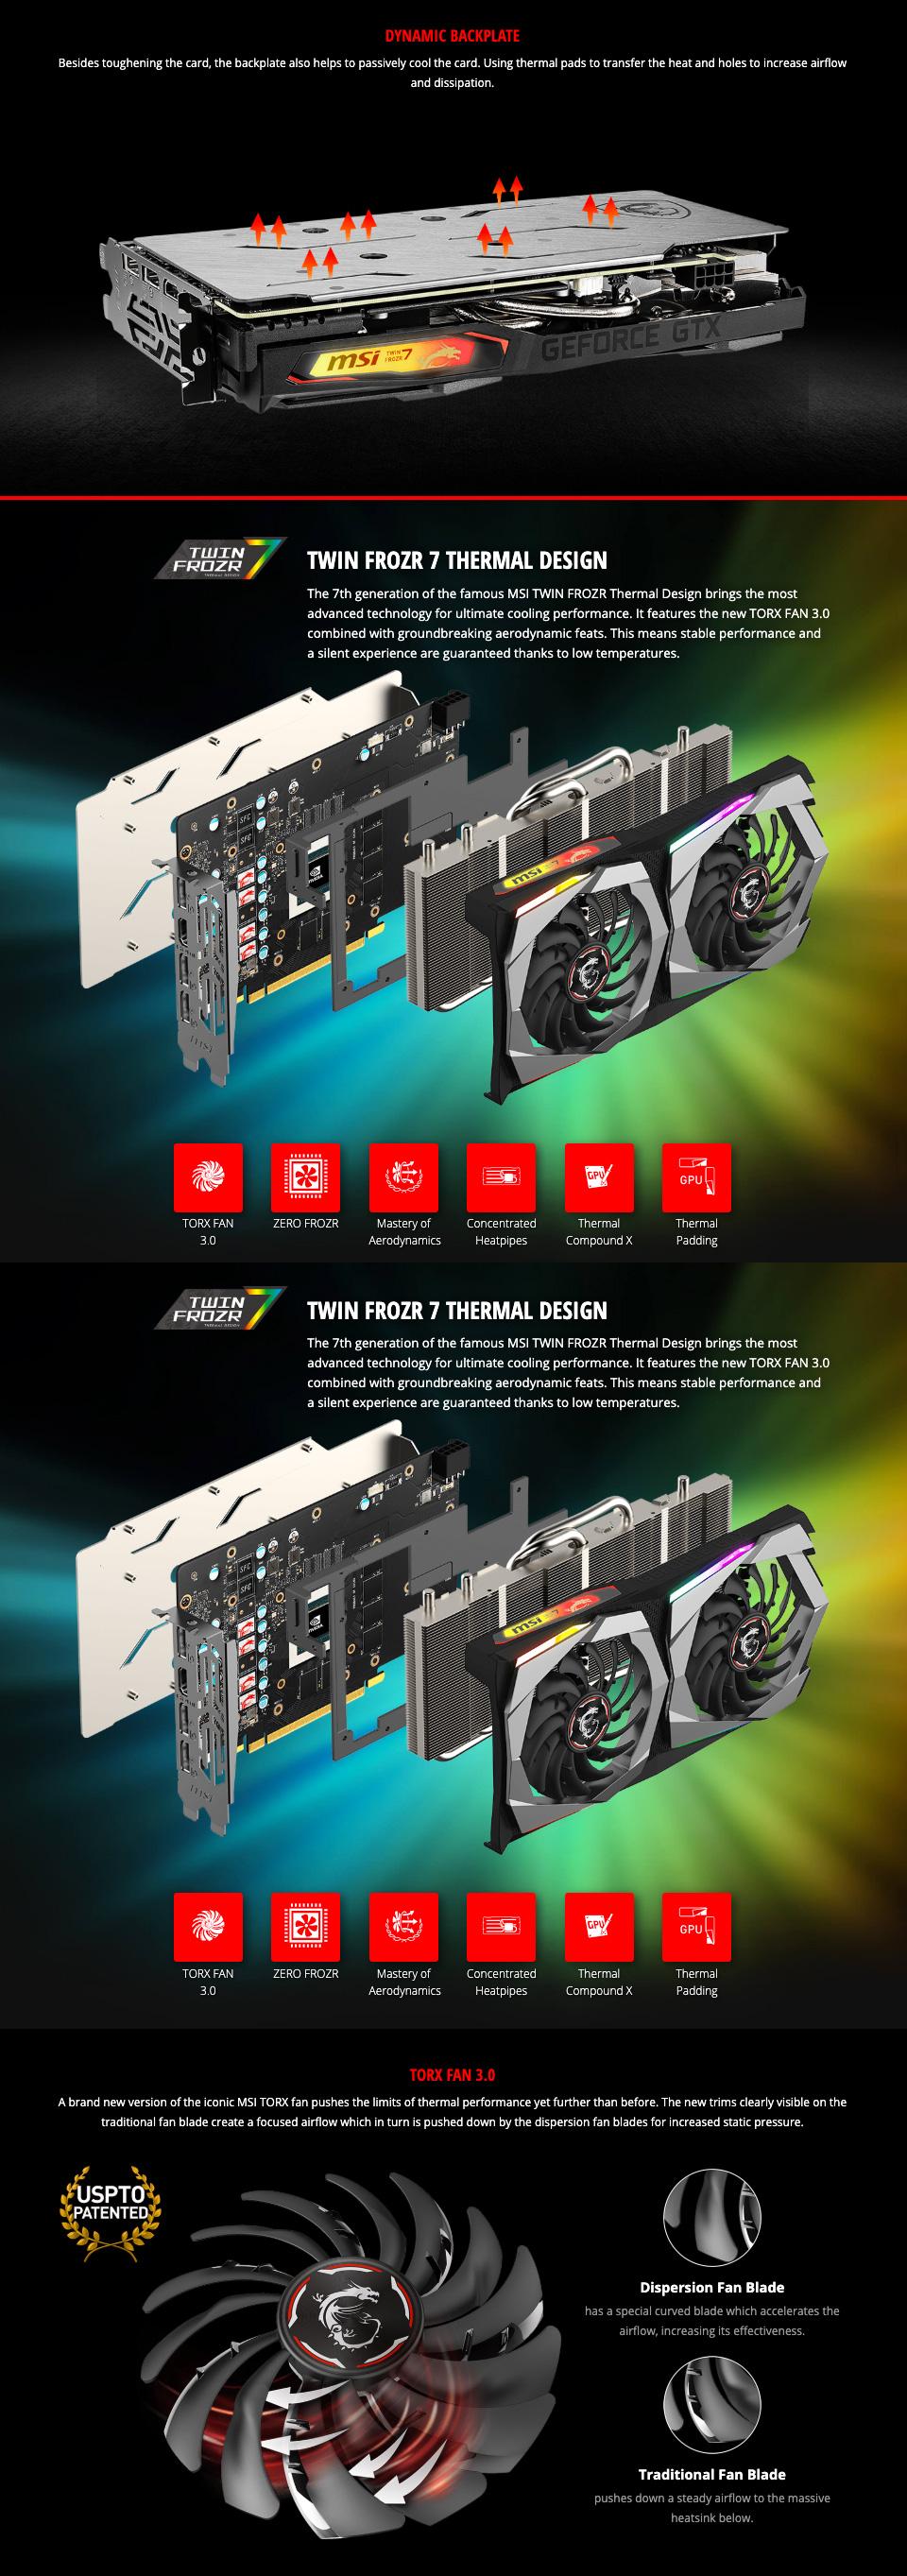 MSI GeForce GTX 1660 Super Gaming X 6GB features 2